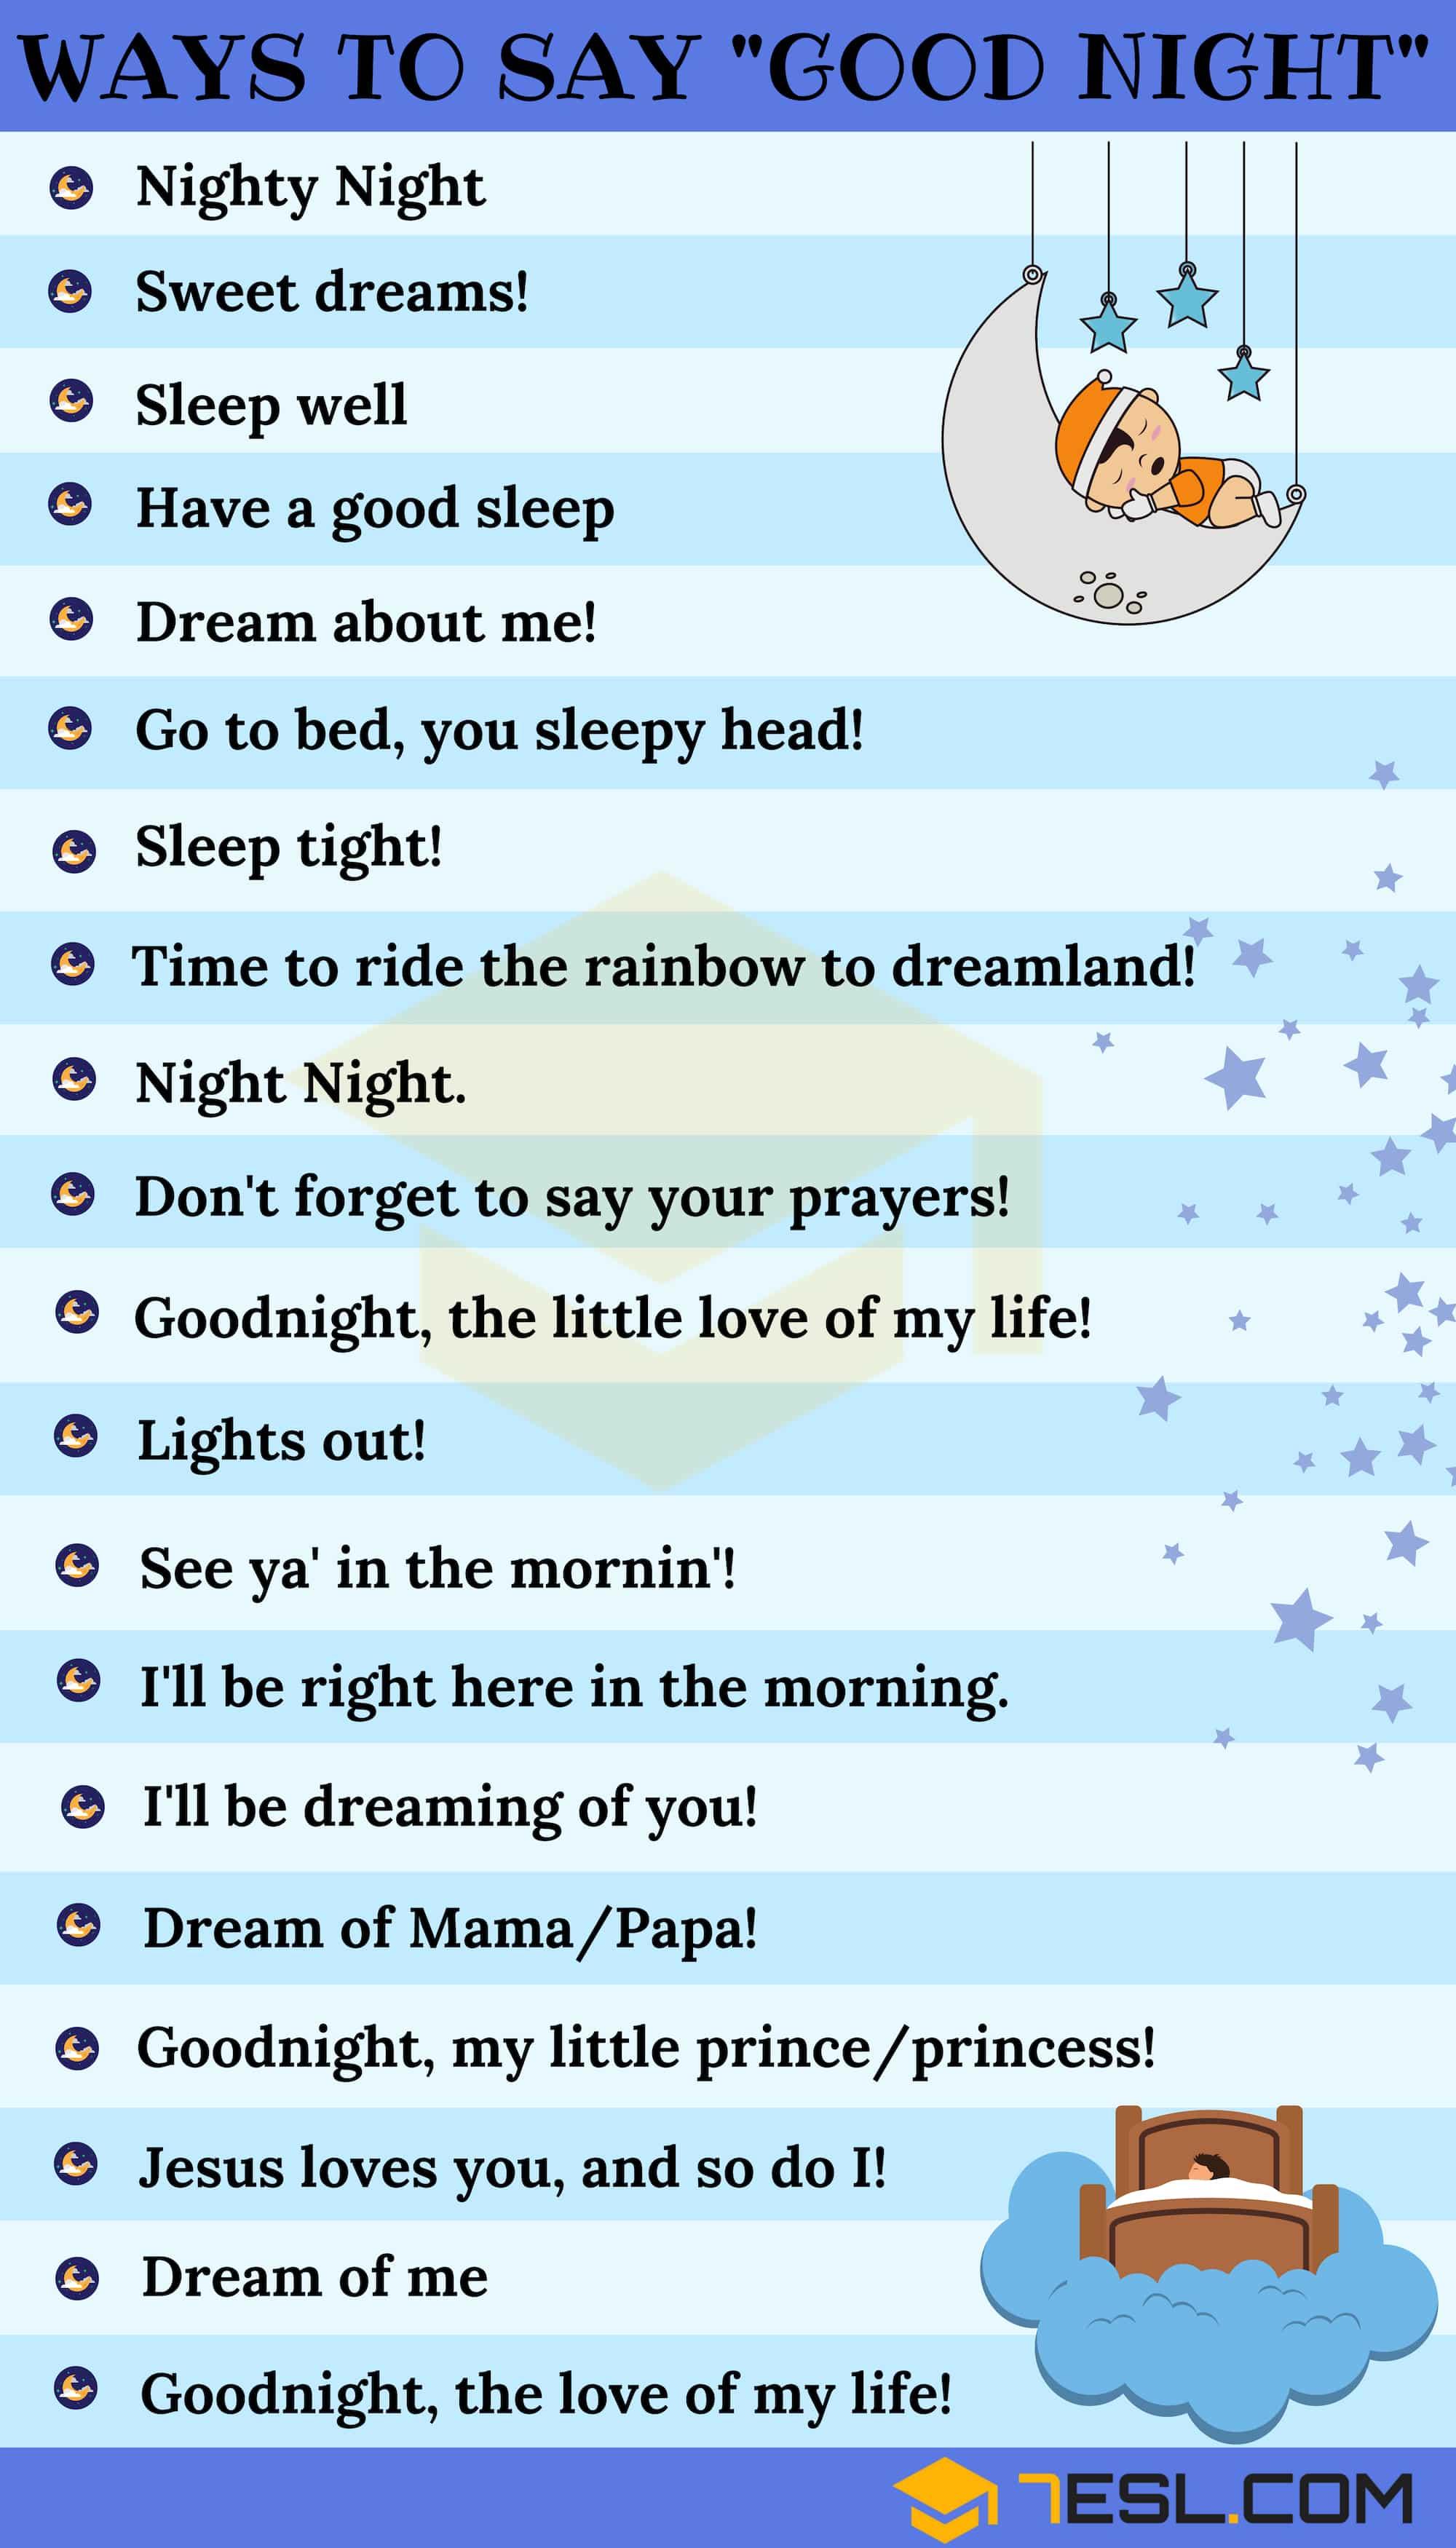 Funny Ways To Say Goodnight : funny, goodnight,